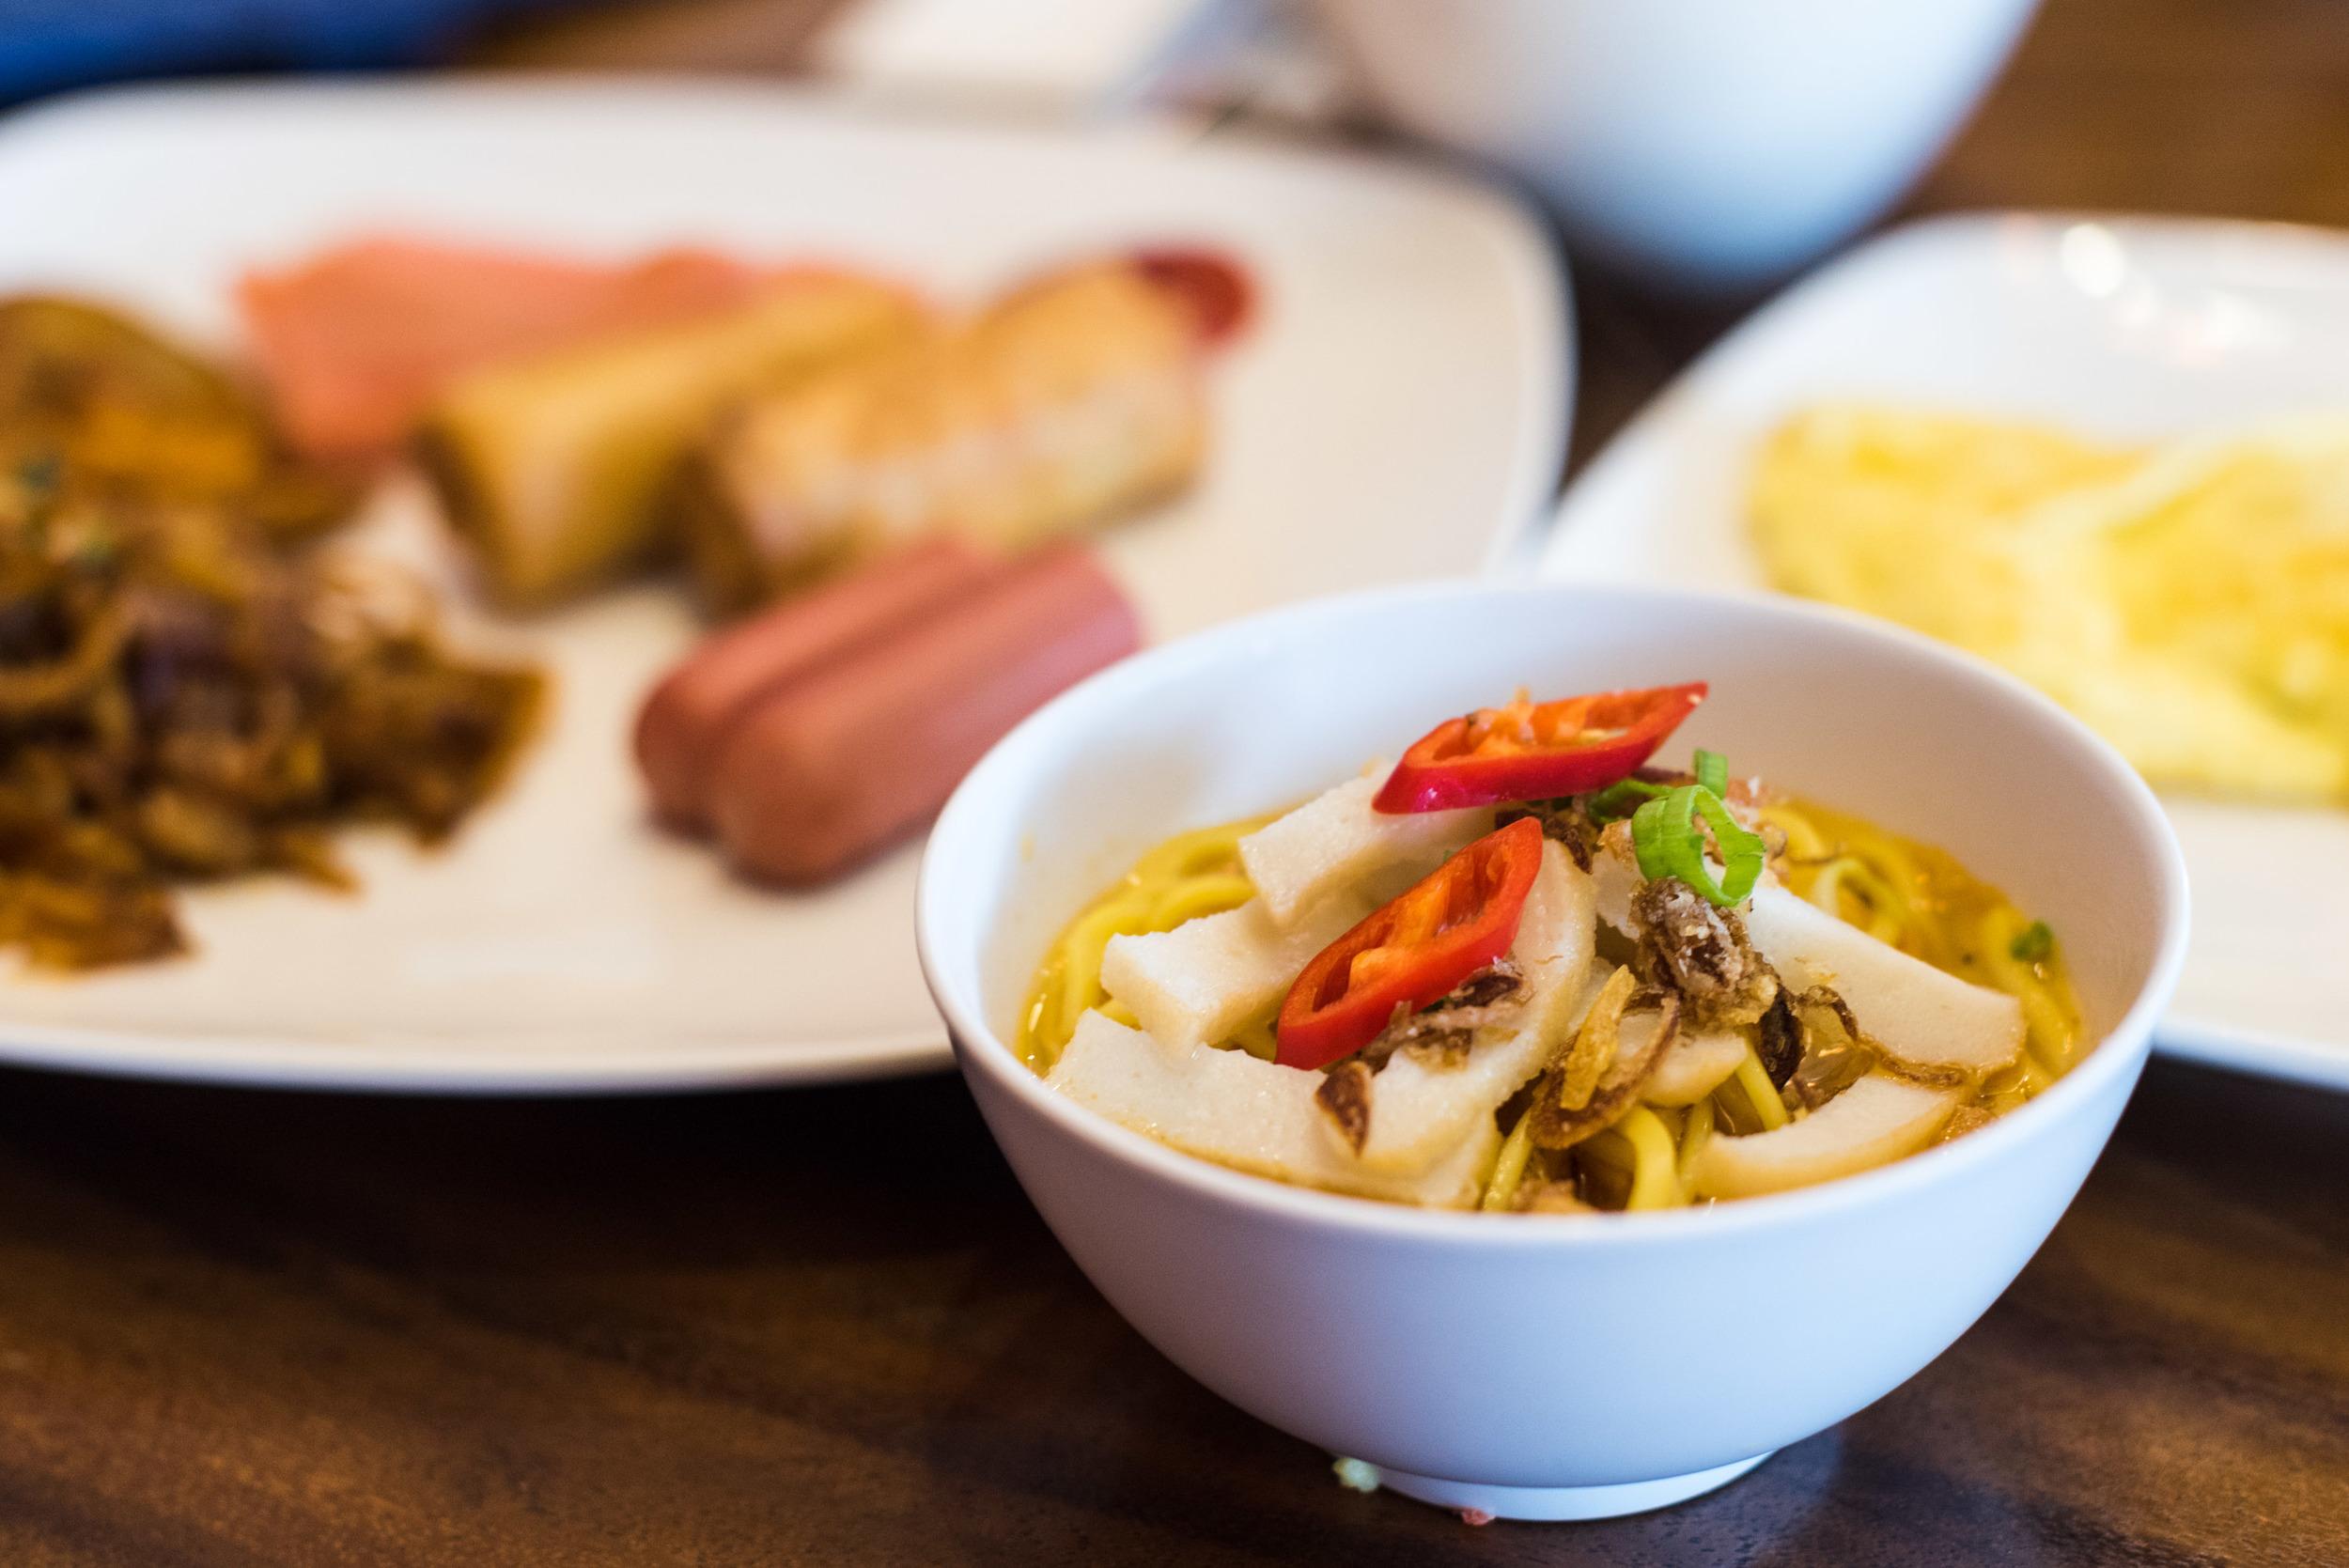 Breakfast at Pappasan (Dorsett Singapore)